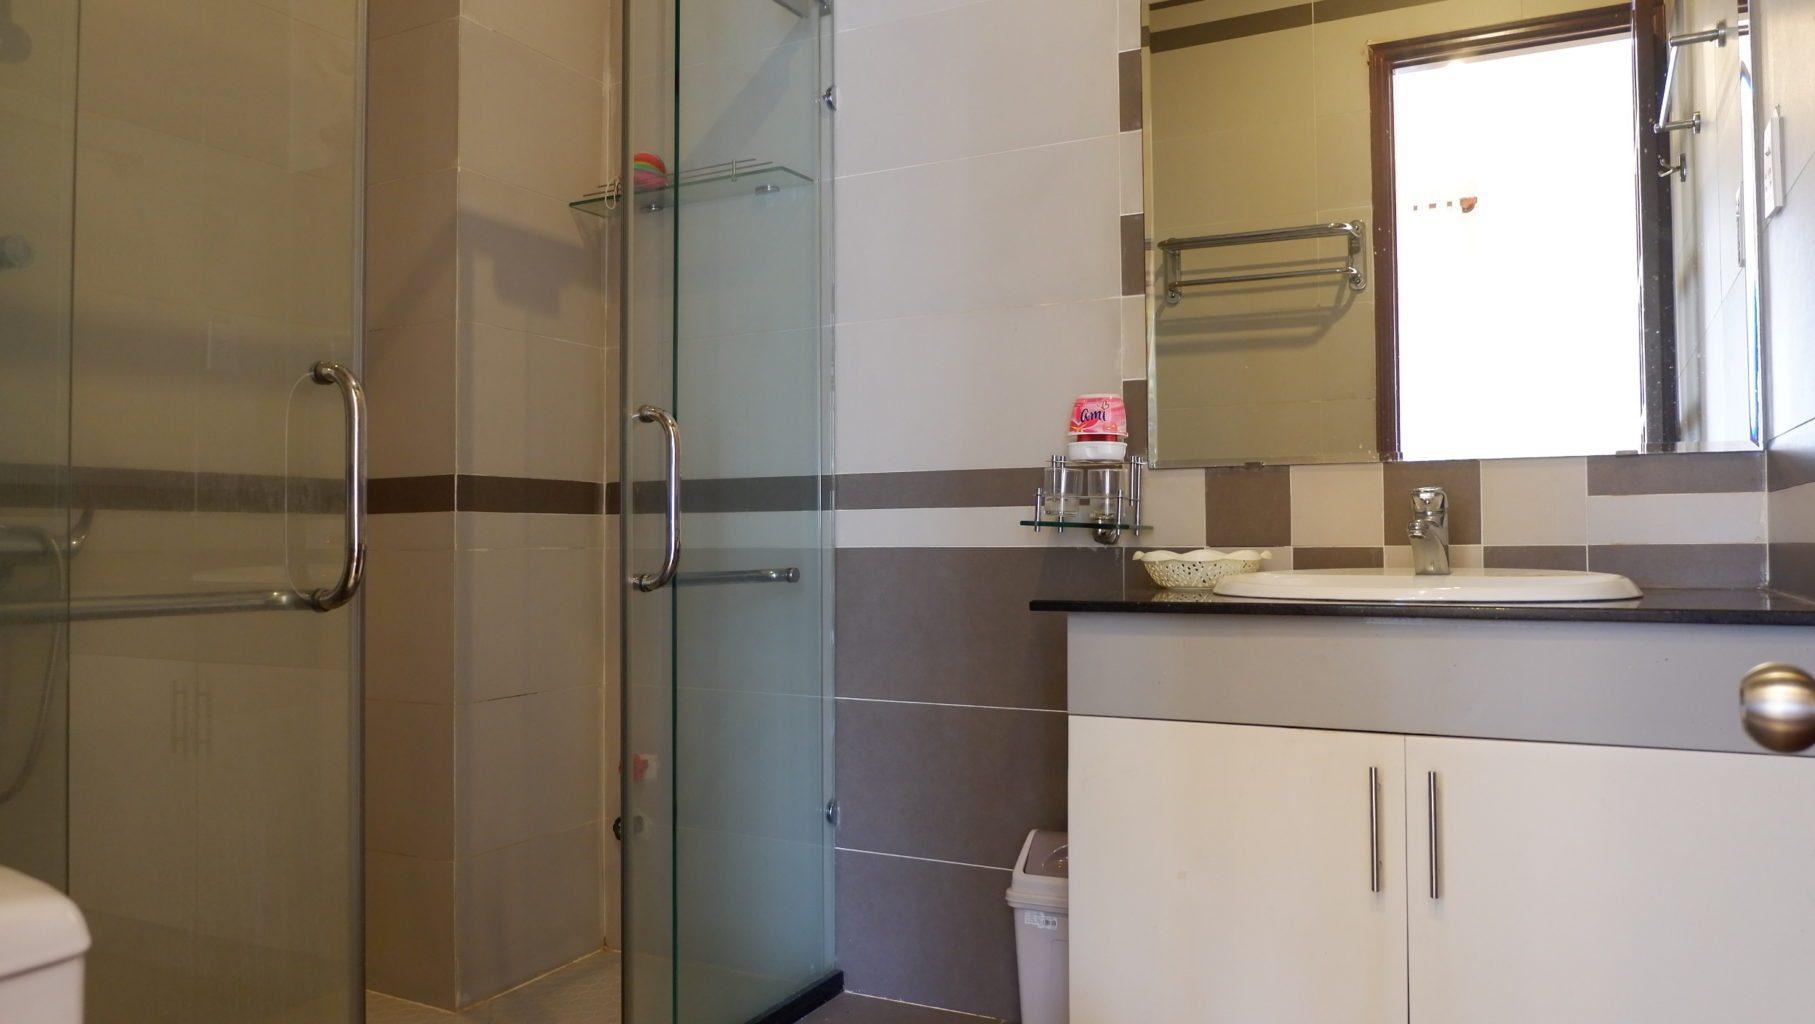 toilet cao cap biet thu vung tau ali 8B